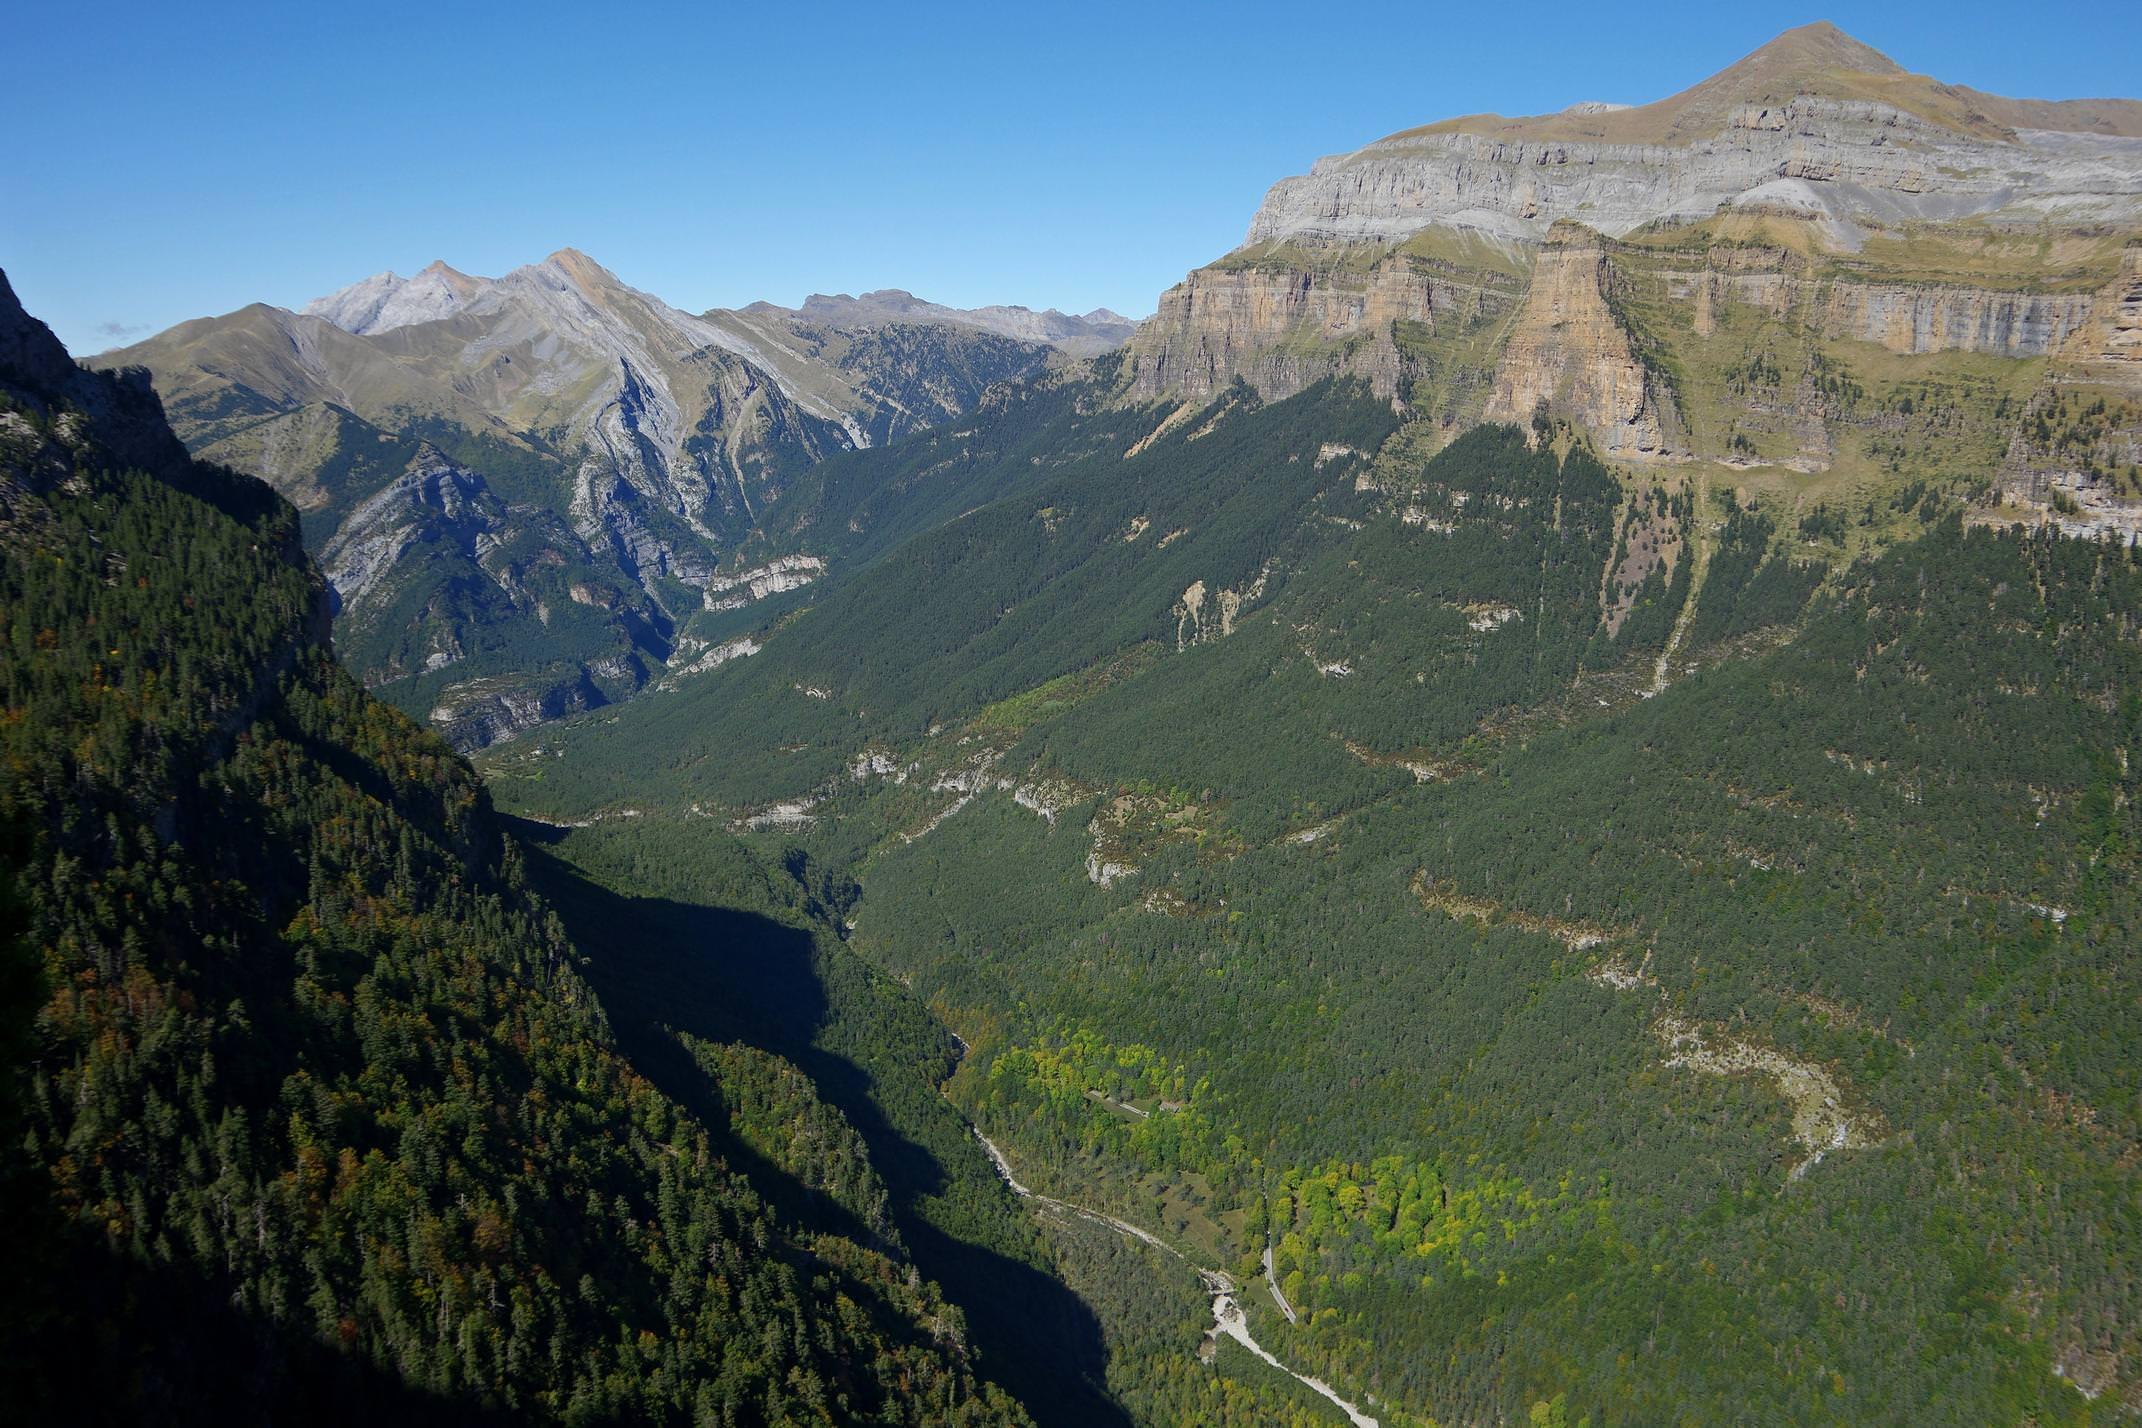 Spain pyrenees ordesa valley chris bladon 21